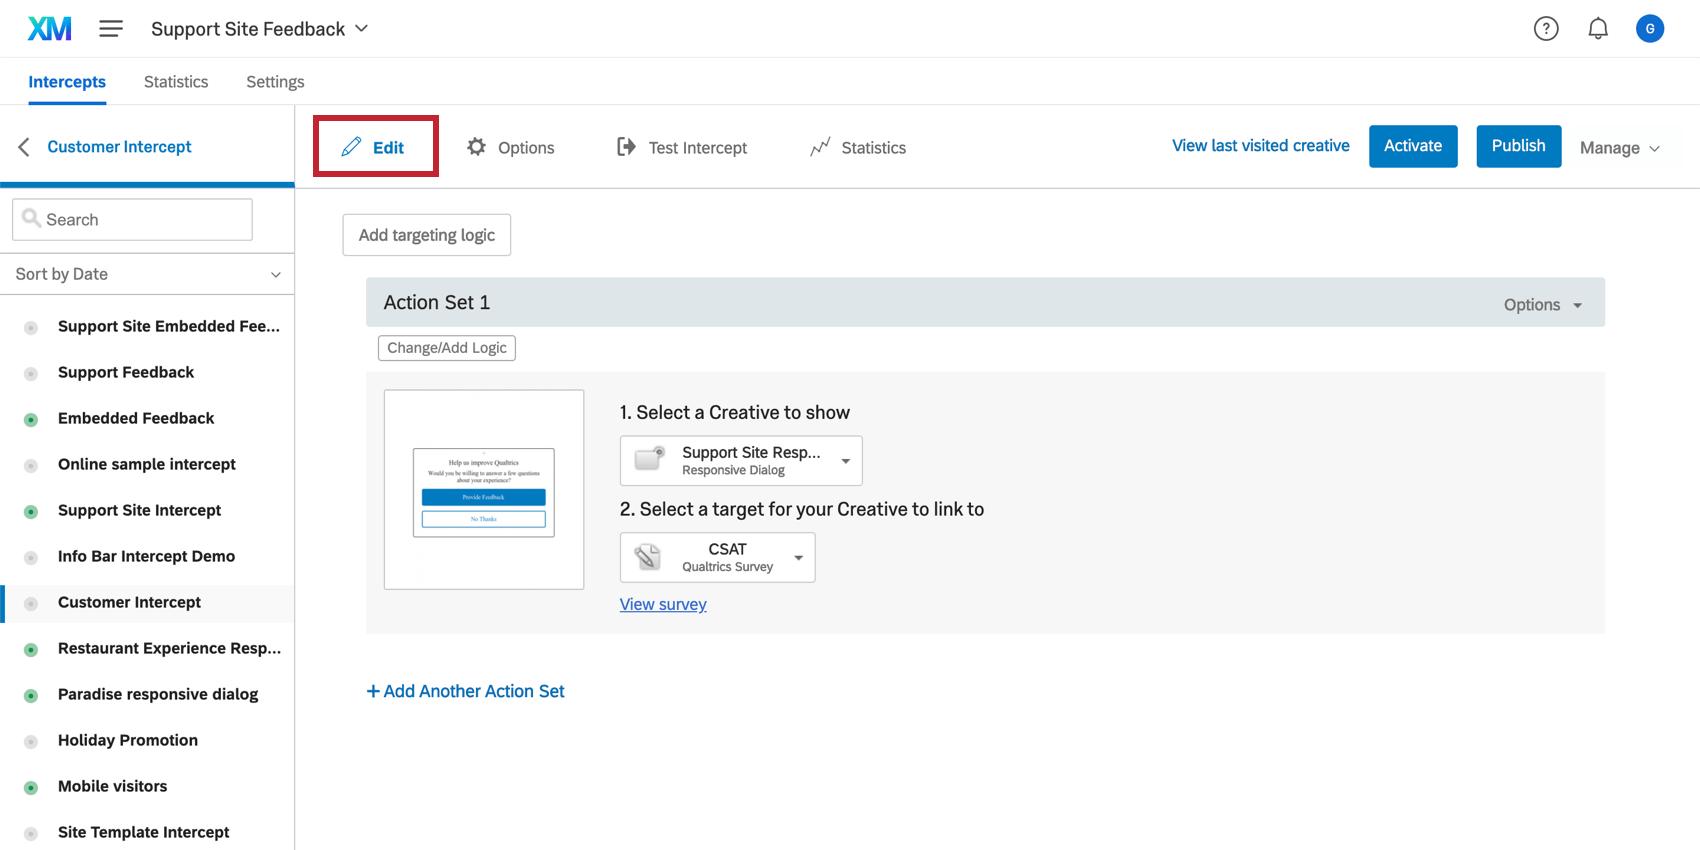 Edit intercepts section in Website / App Feedback